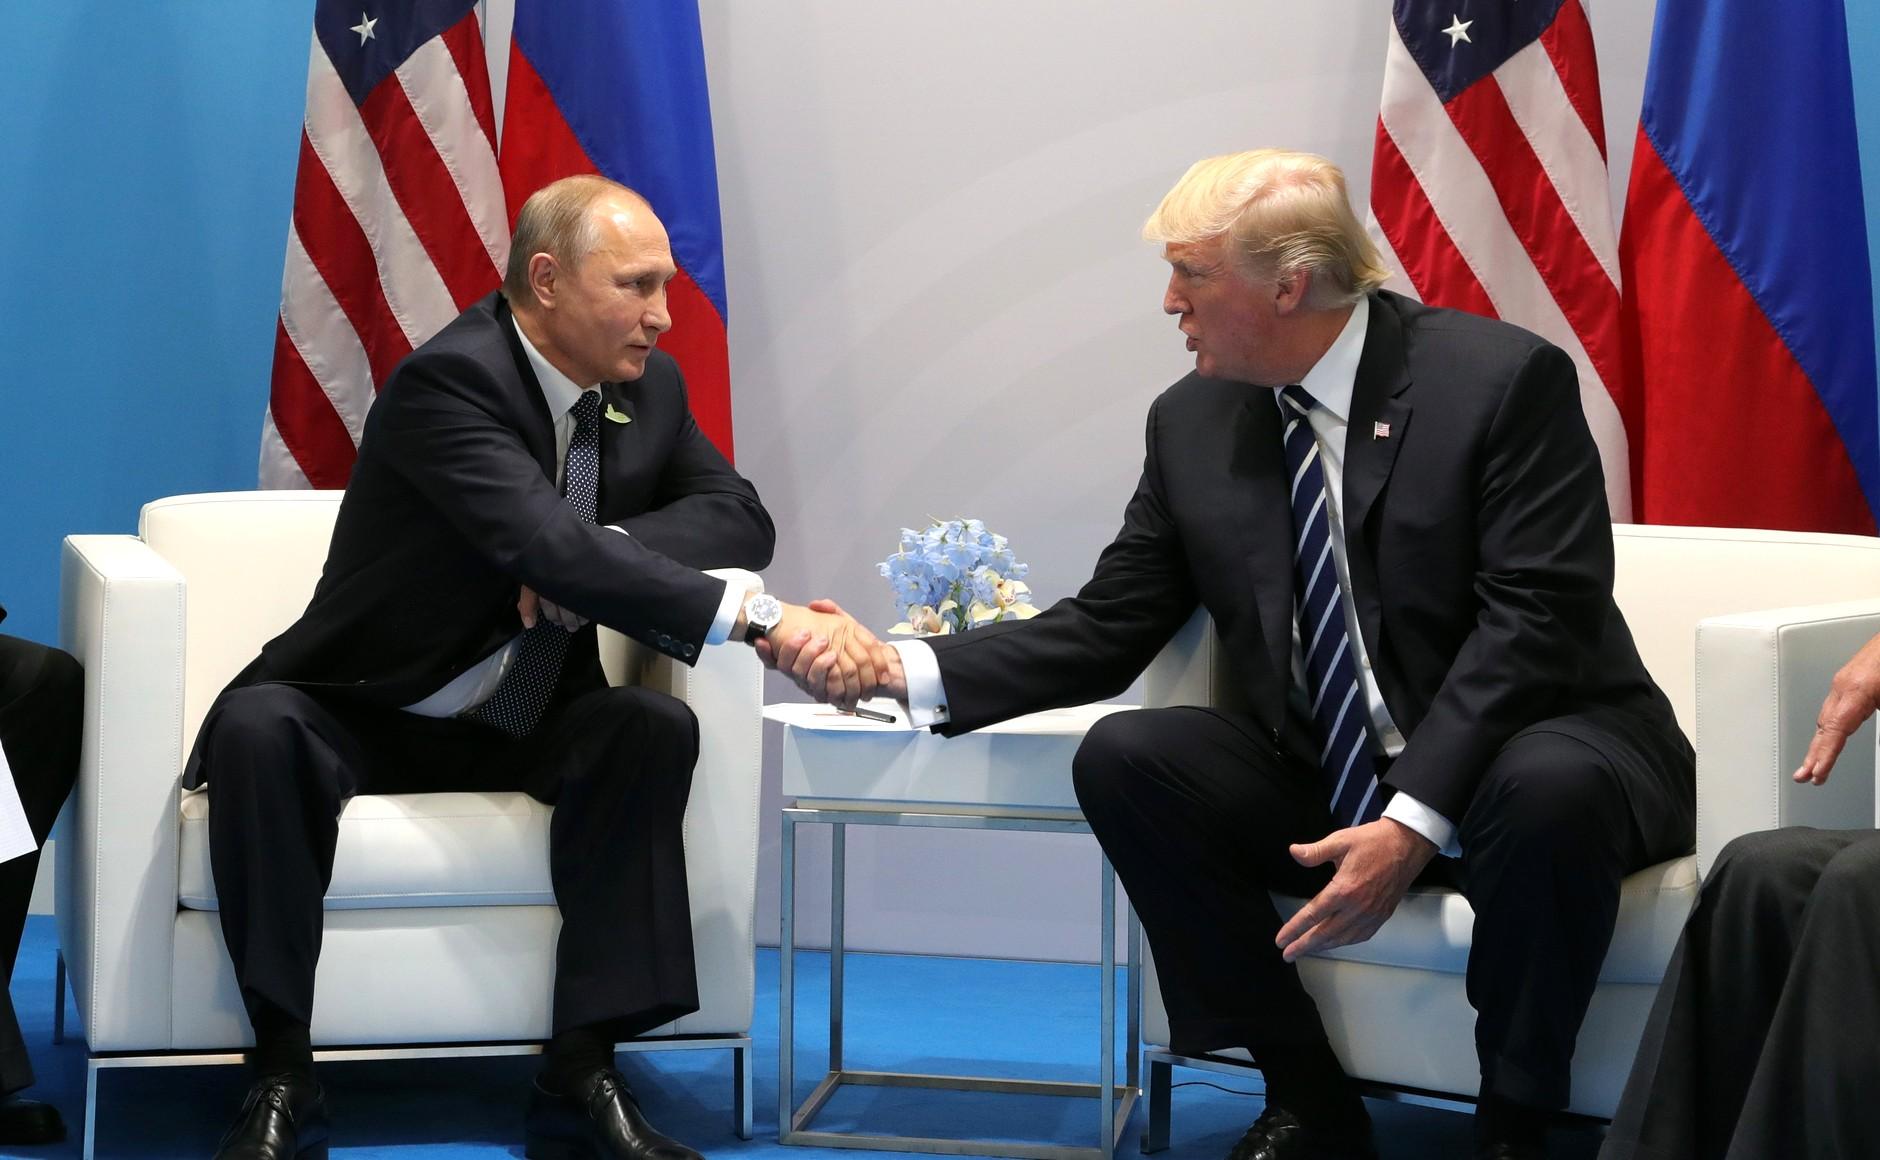 President Donald Trump meets with Russian President Vladimir Putin at the 2017 G20 Summit in Hamburg, Germany. (Wikimedia Commons)